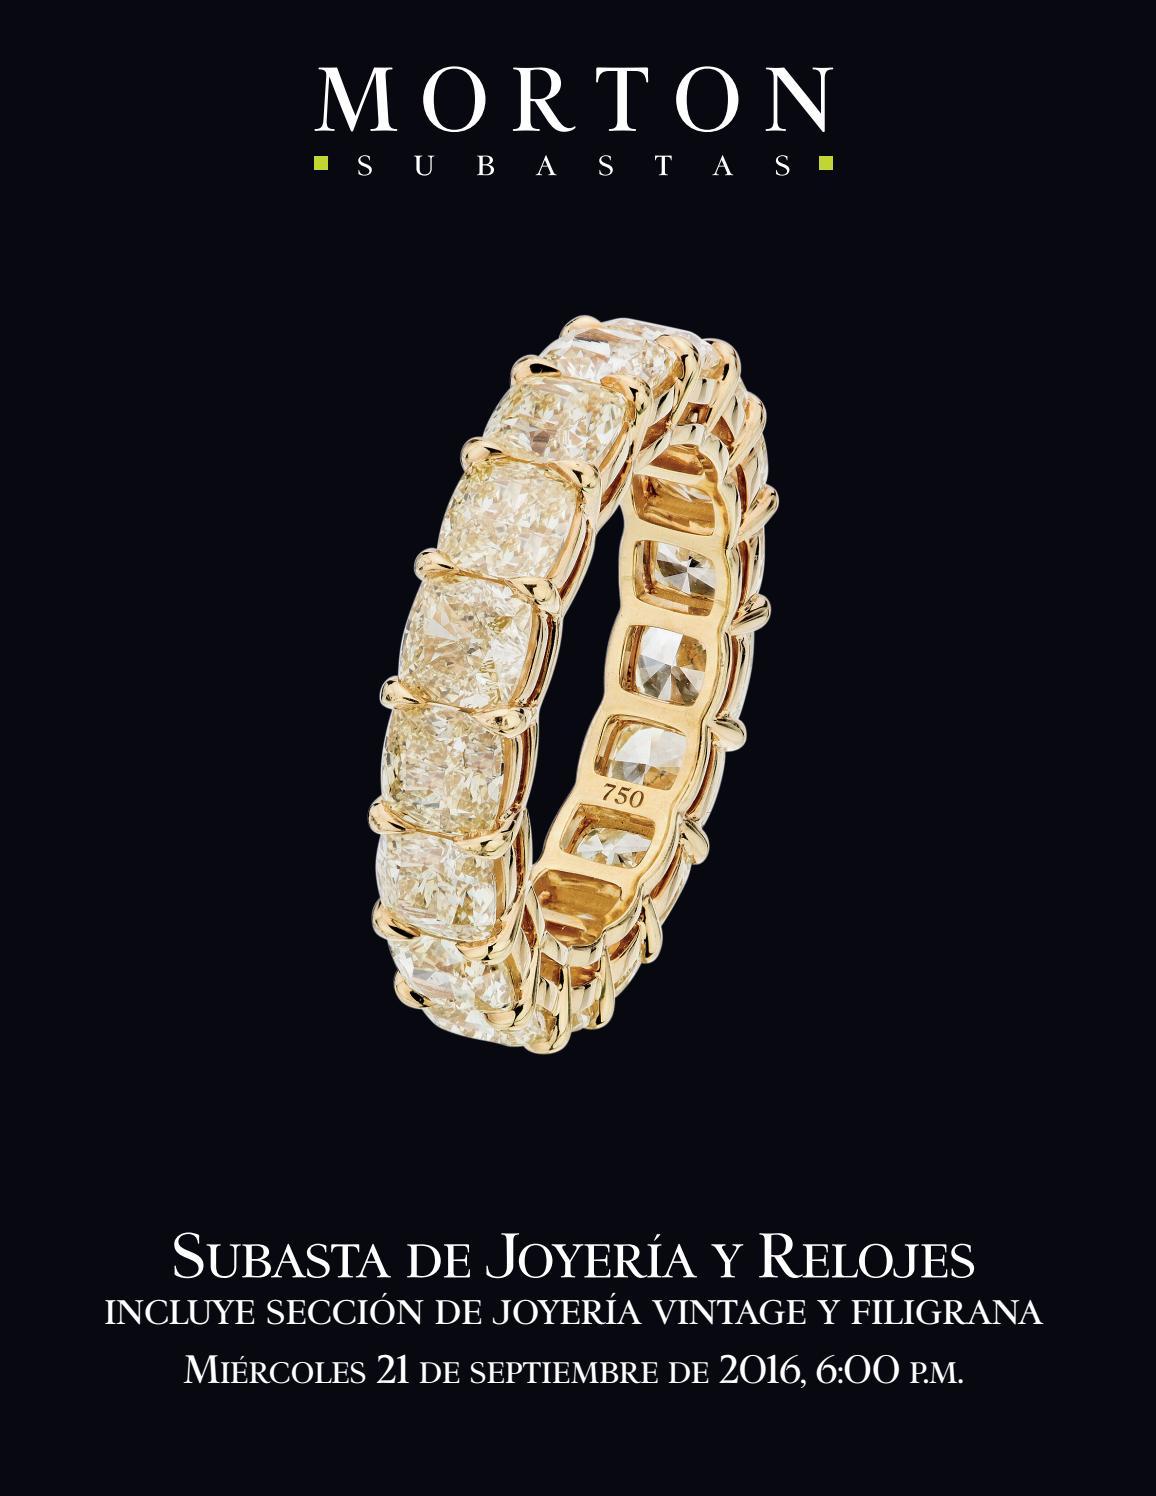 Cierre magnético-Platino-Ø 9 mm-pulsera fabricar joyas